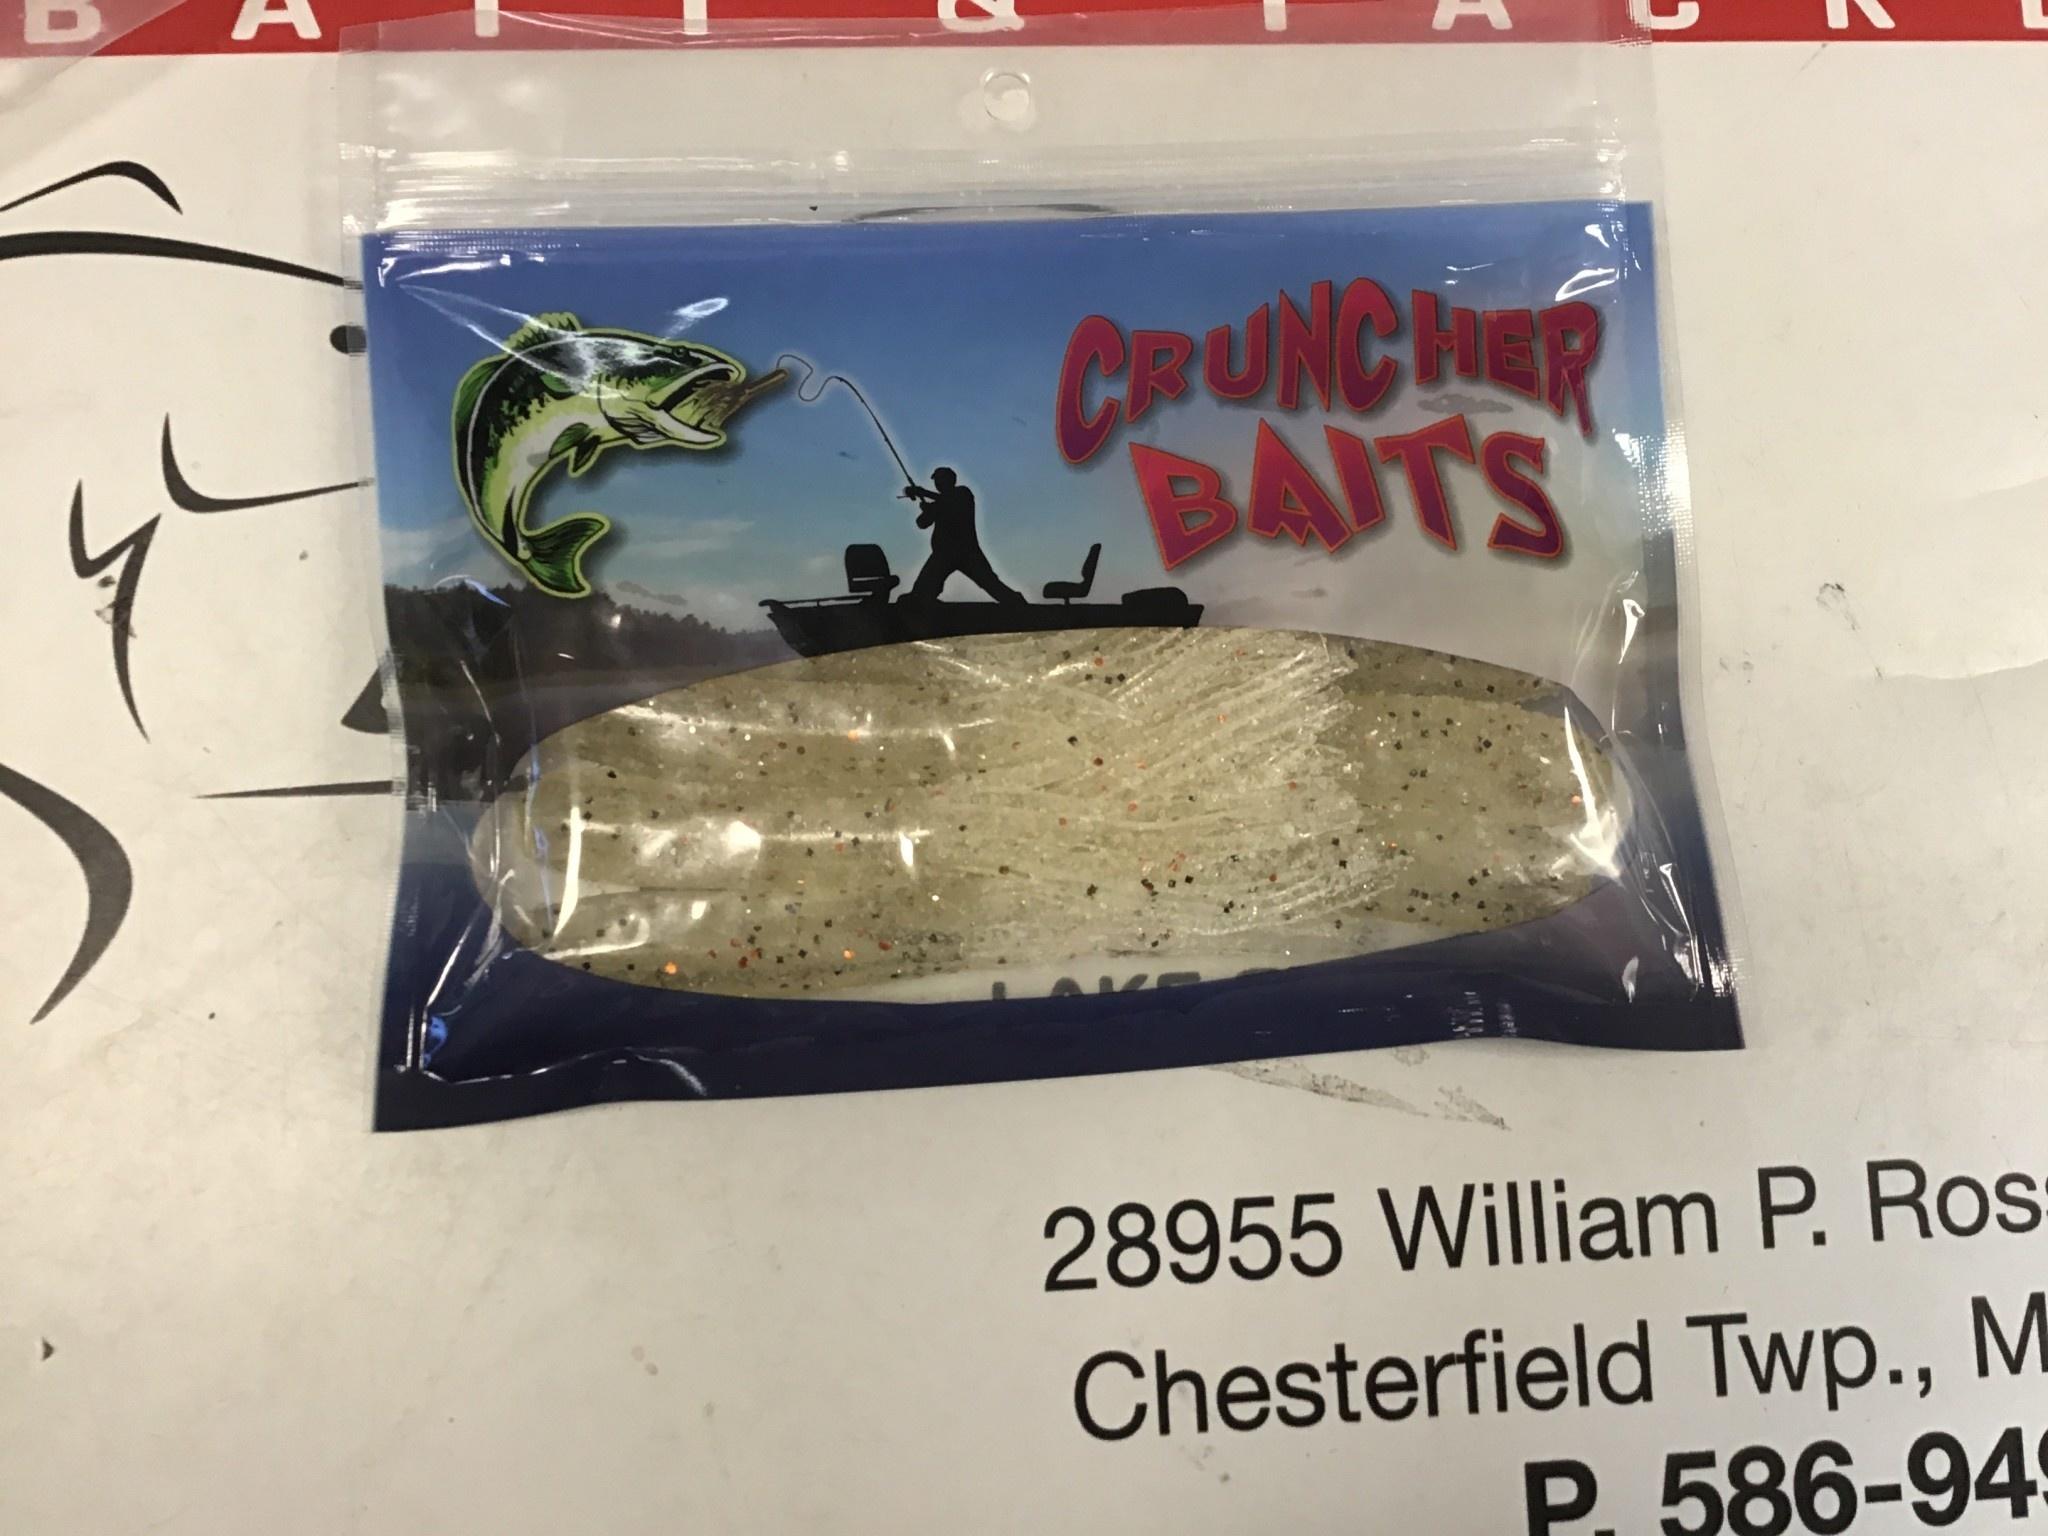 Cruncher Baits S & L Cruncher Bait Sandy Goby